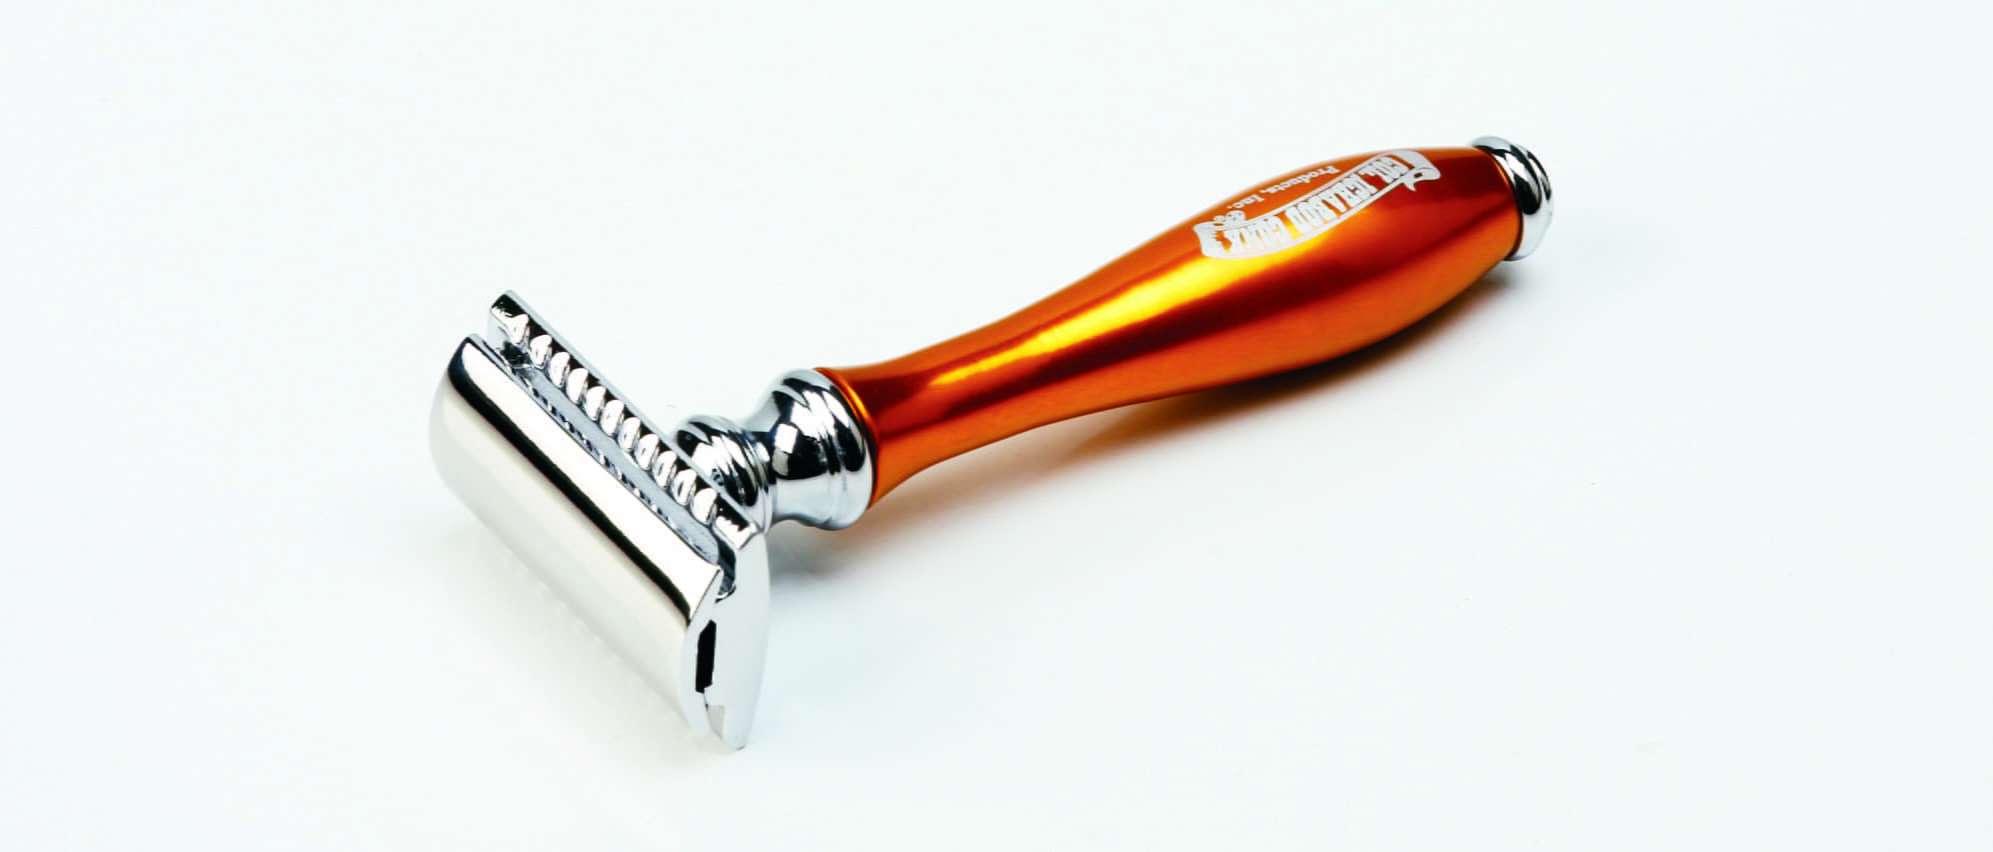 Safety razor for everyday use